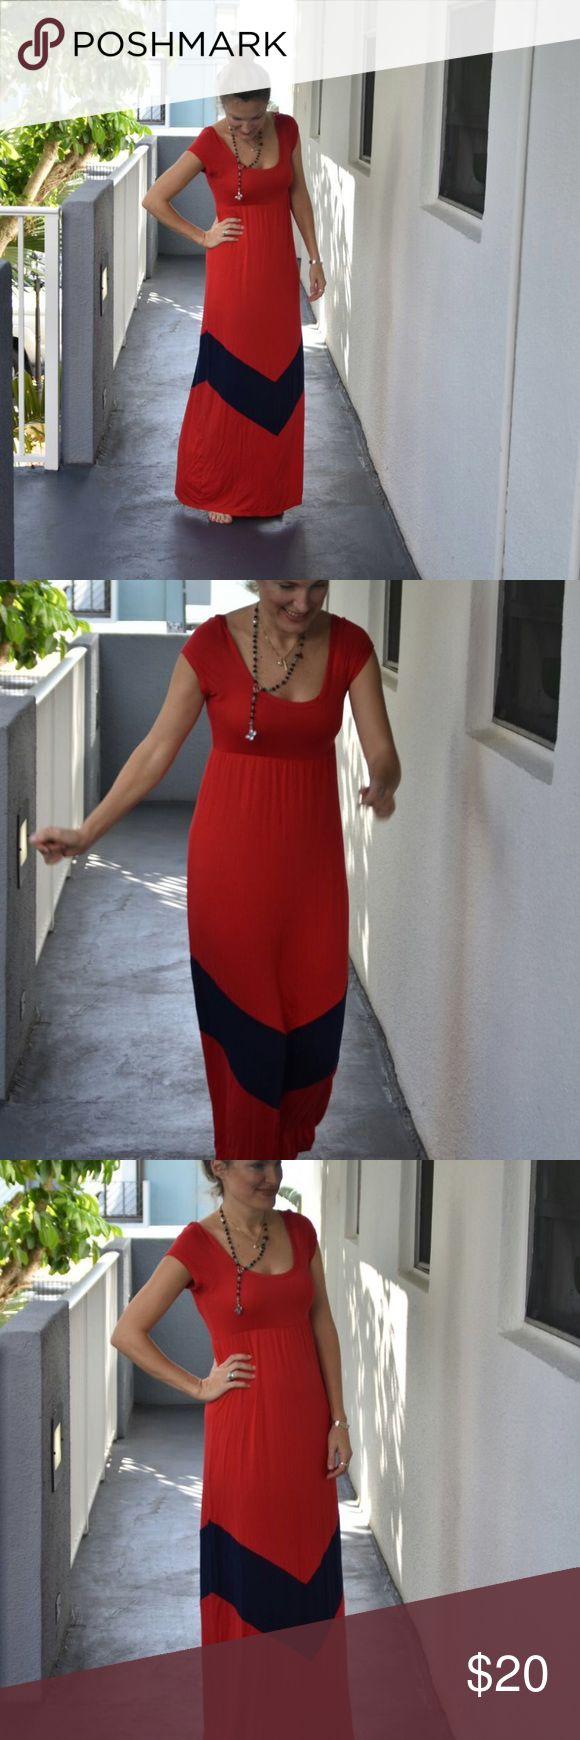 Gabriella Rocha maxi dress red and blue 🍒🍒🍒 Gabriella Rocha Maxi dress in size medium ... 🍒🍒🍒 in great 👍 conditions ... super comfy Gabriella Rocha Dresses Maxi